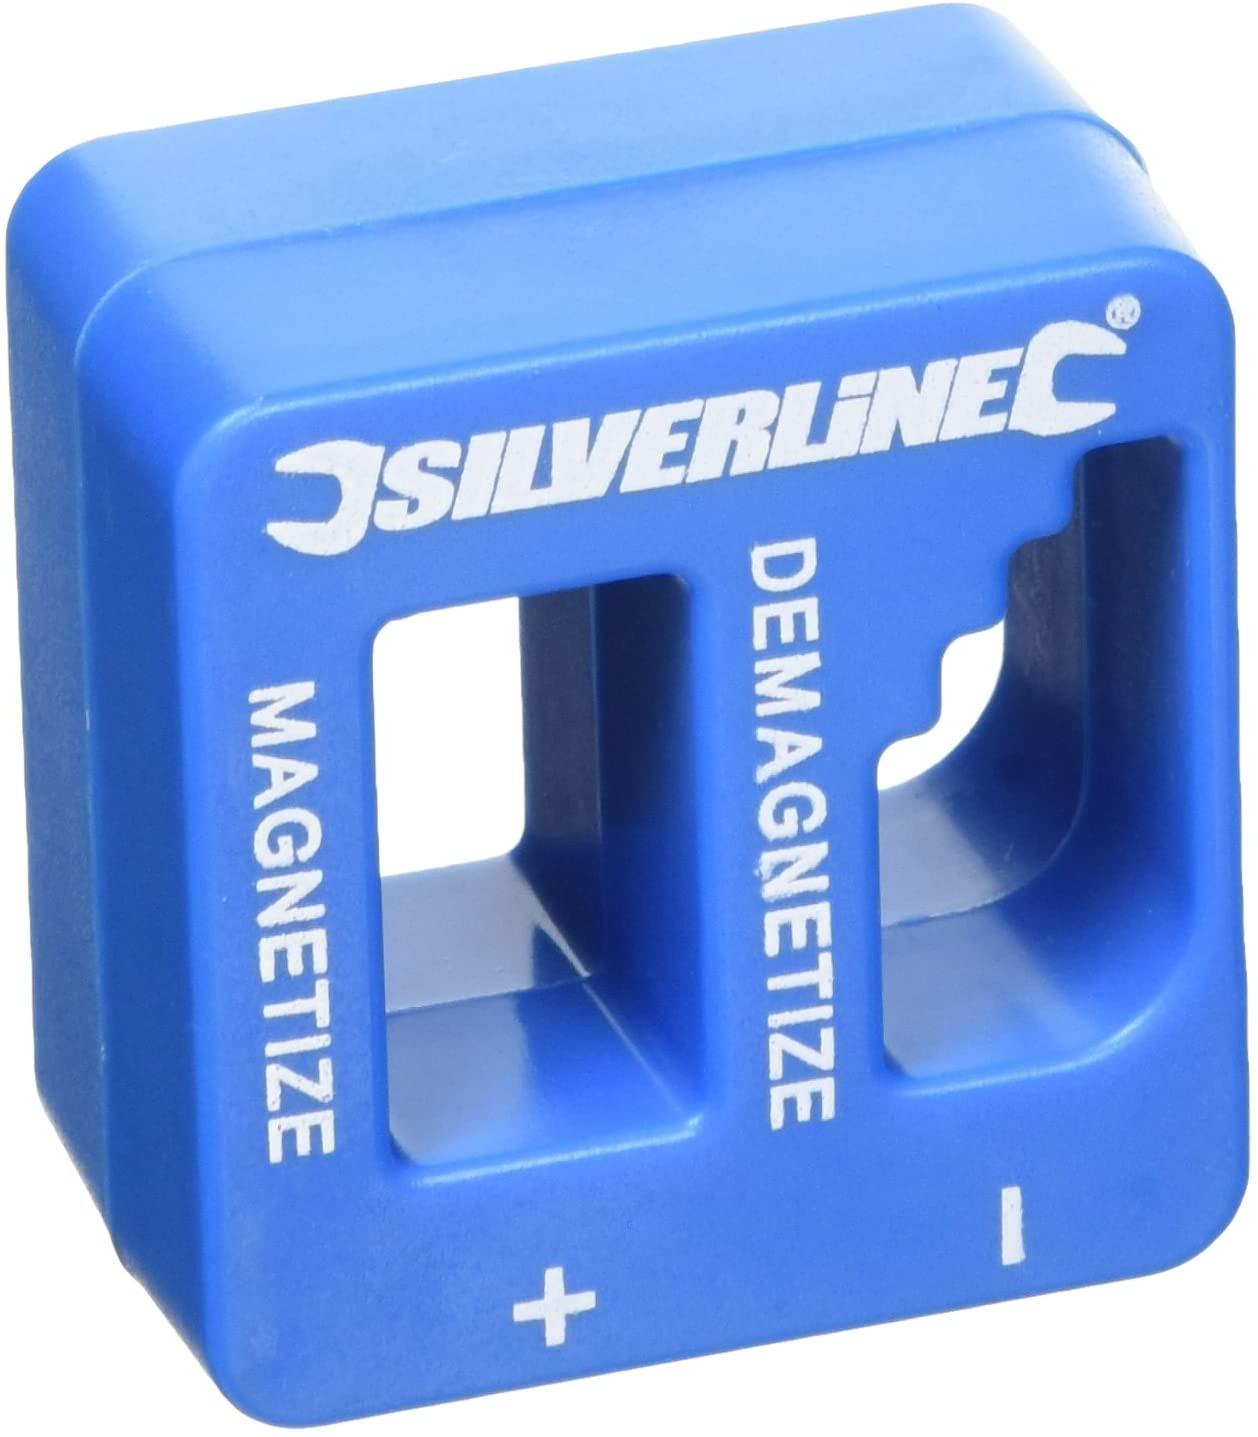 Silverline 245116 Magnetiser Demagnetiser 50 x 50 x 30 mm - £4.68 Prime / +£4.49 non Prime @ Amazon